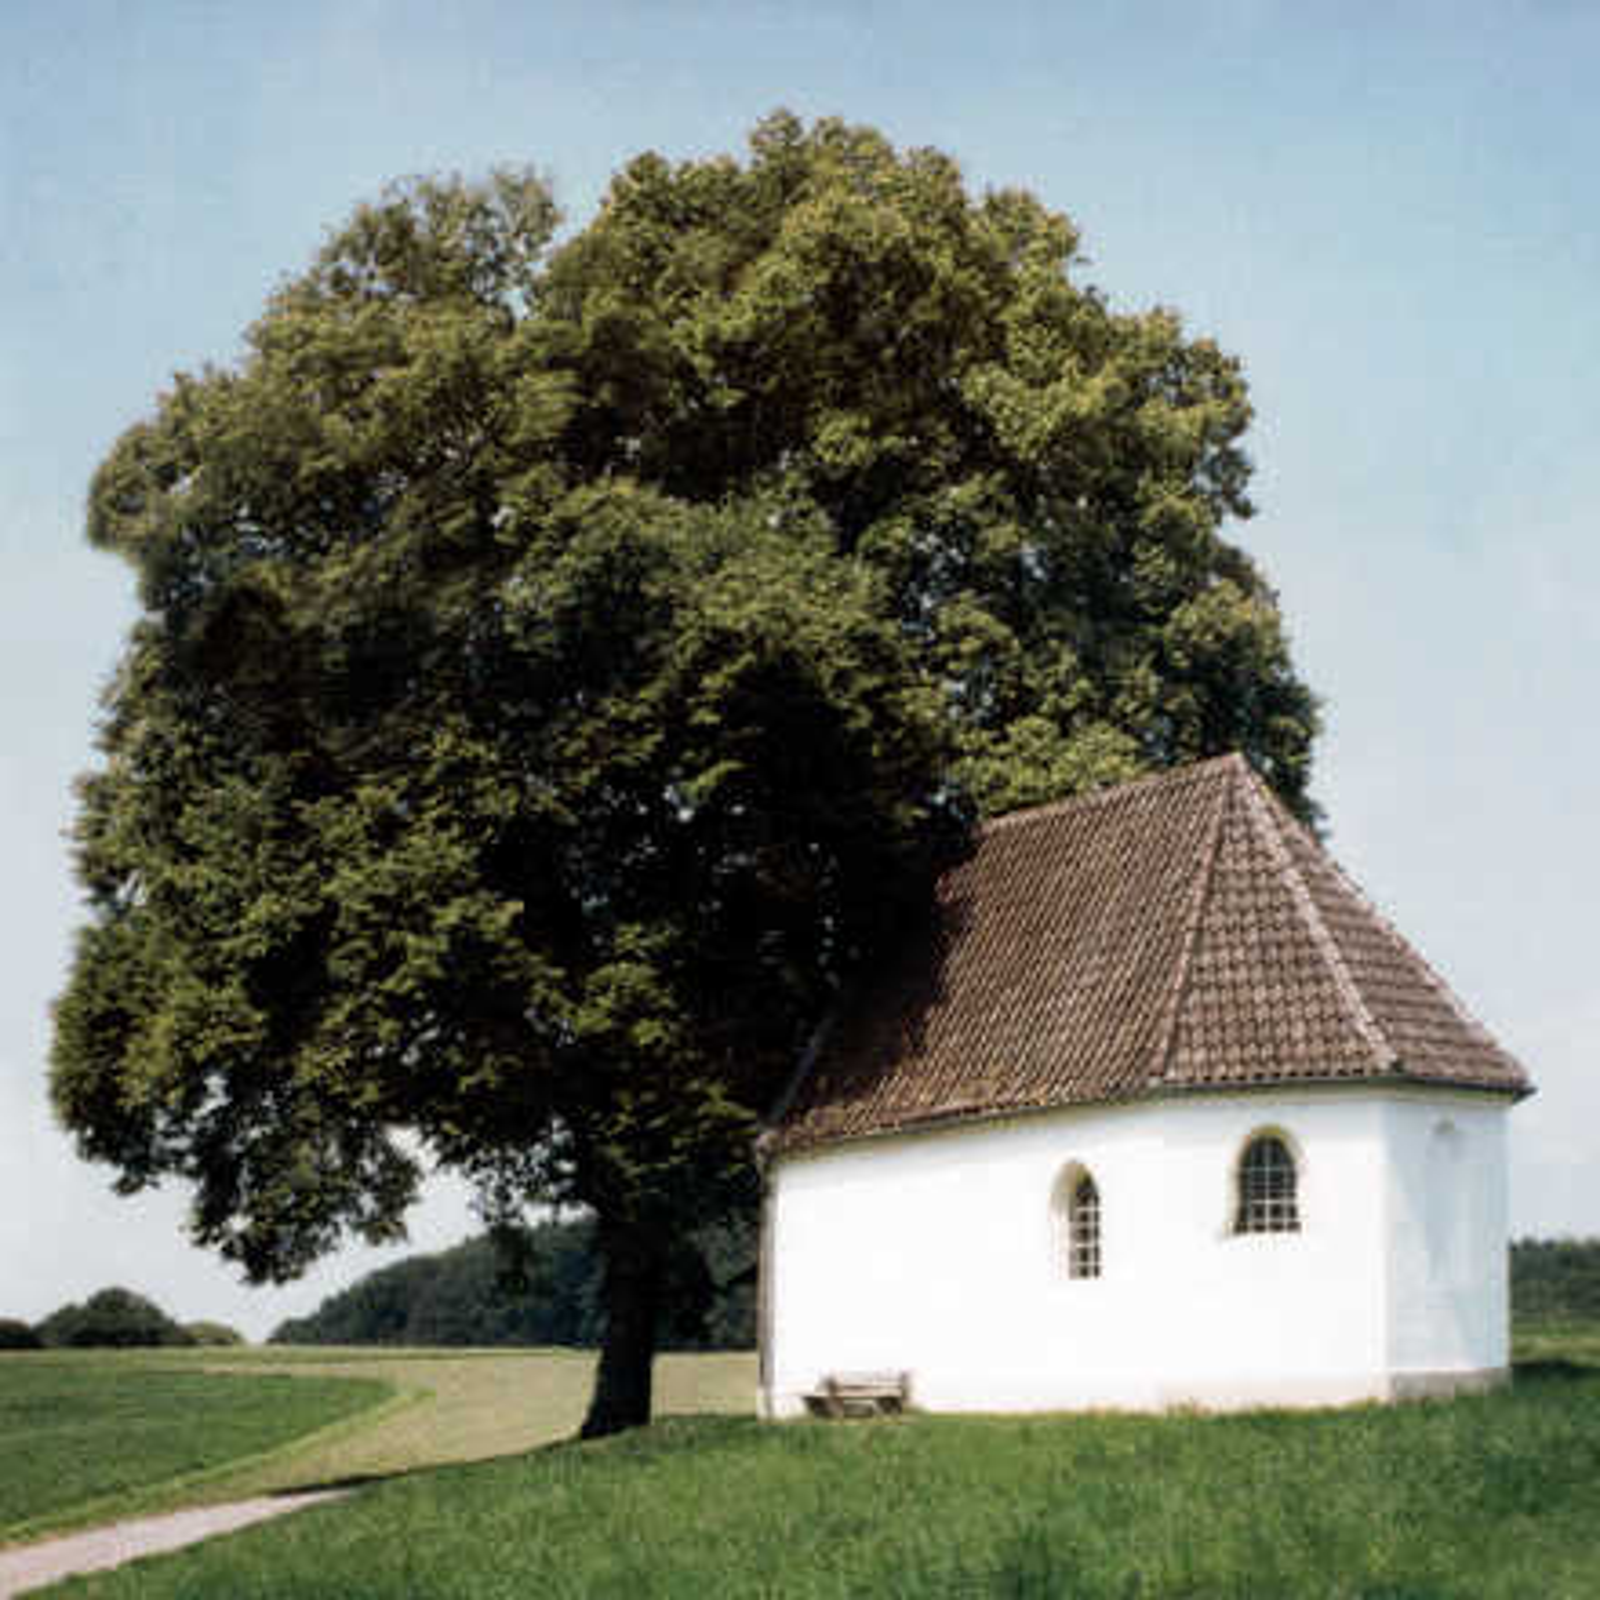 Kapelle - Peter Von Felbert